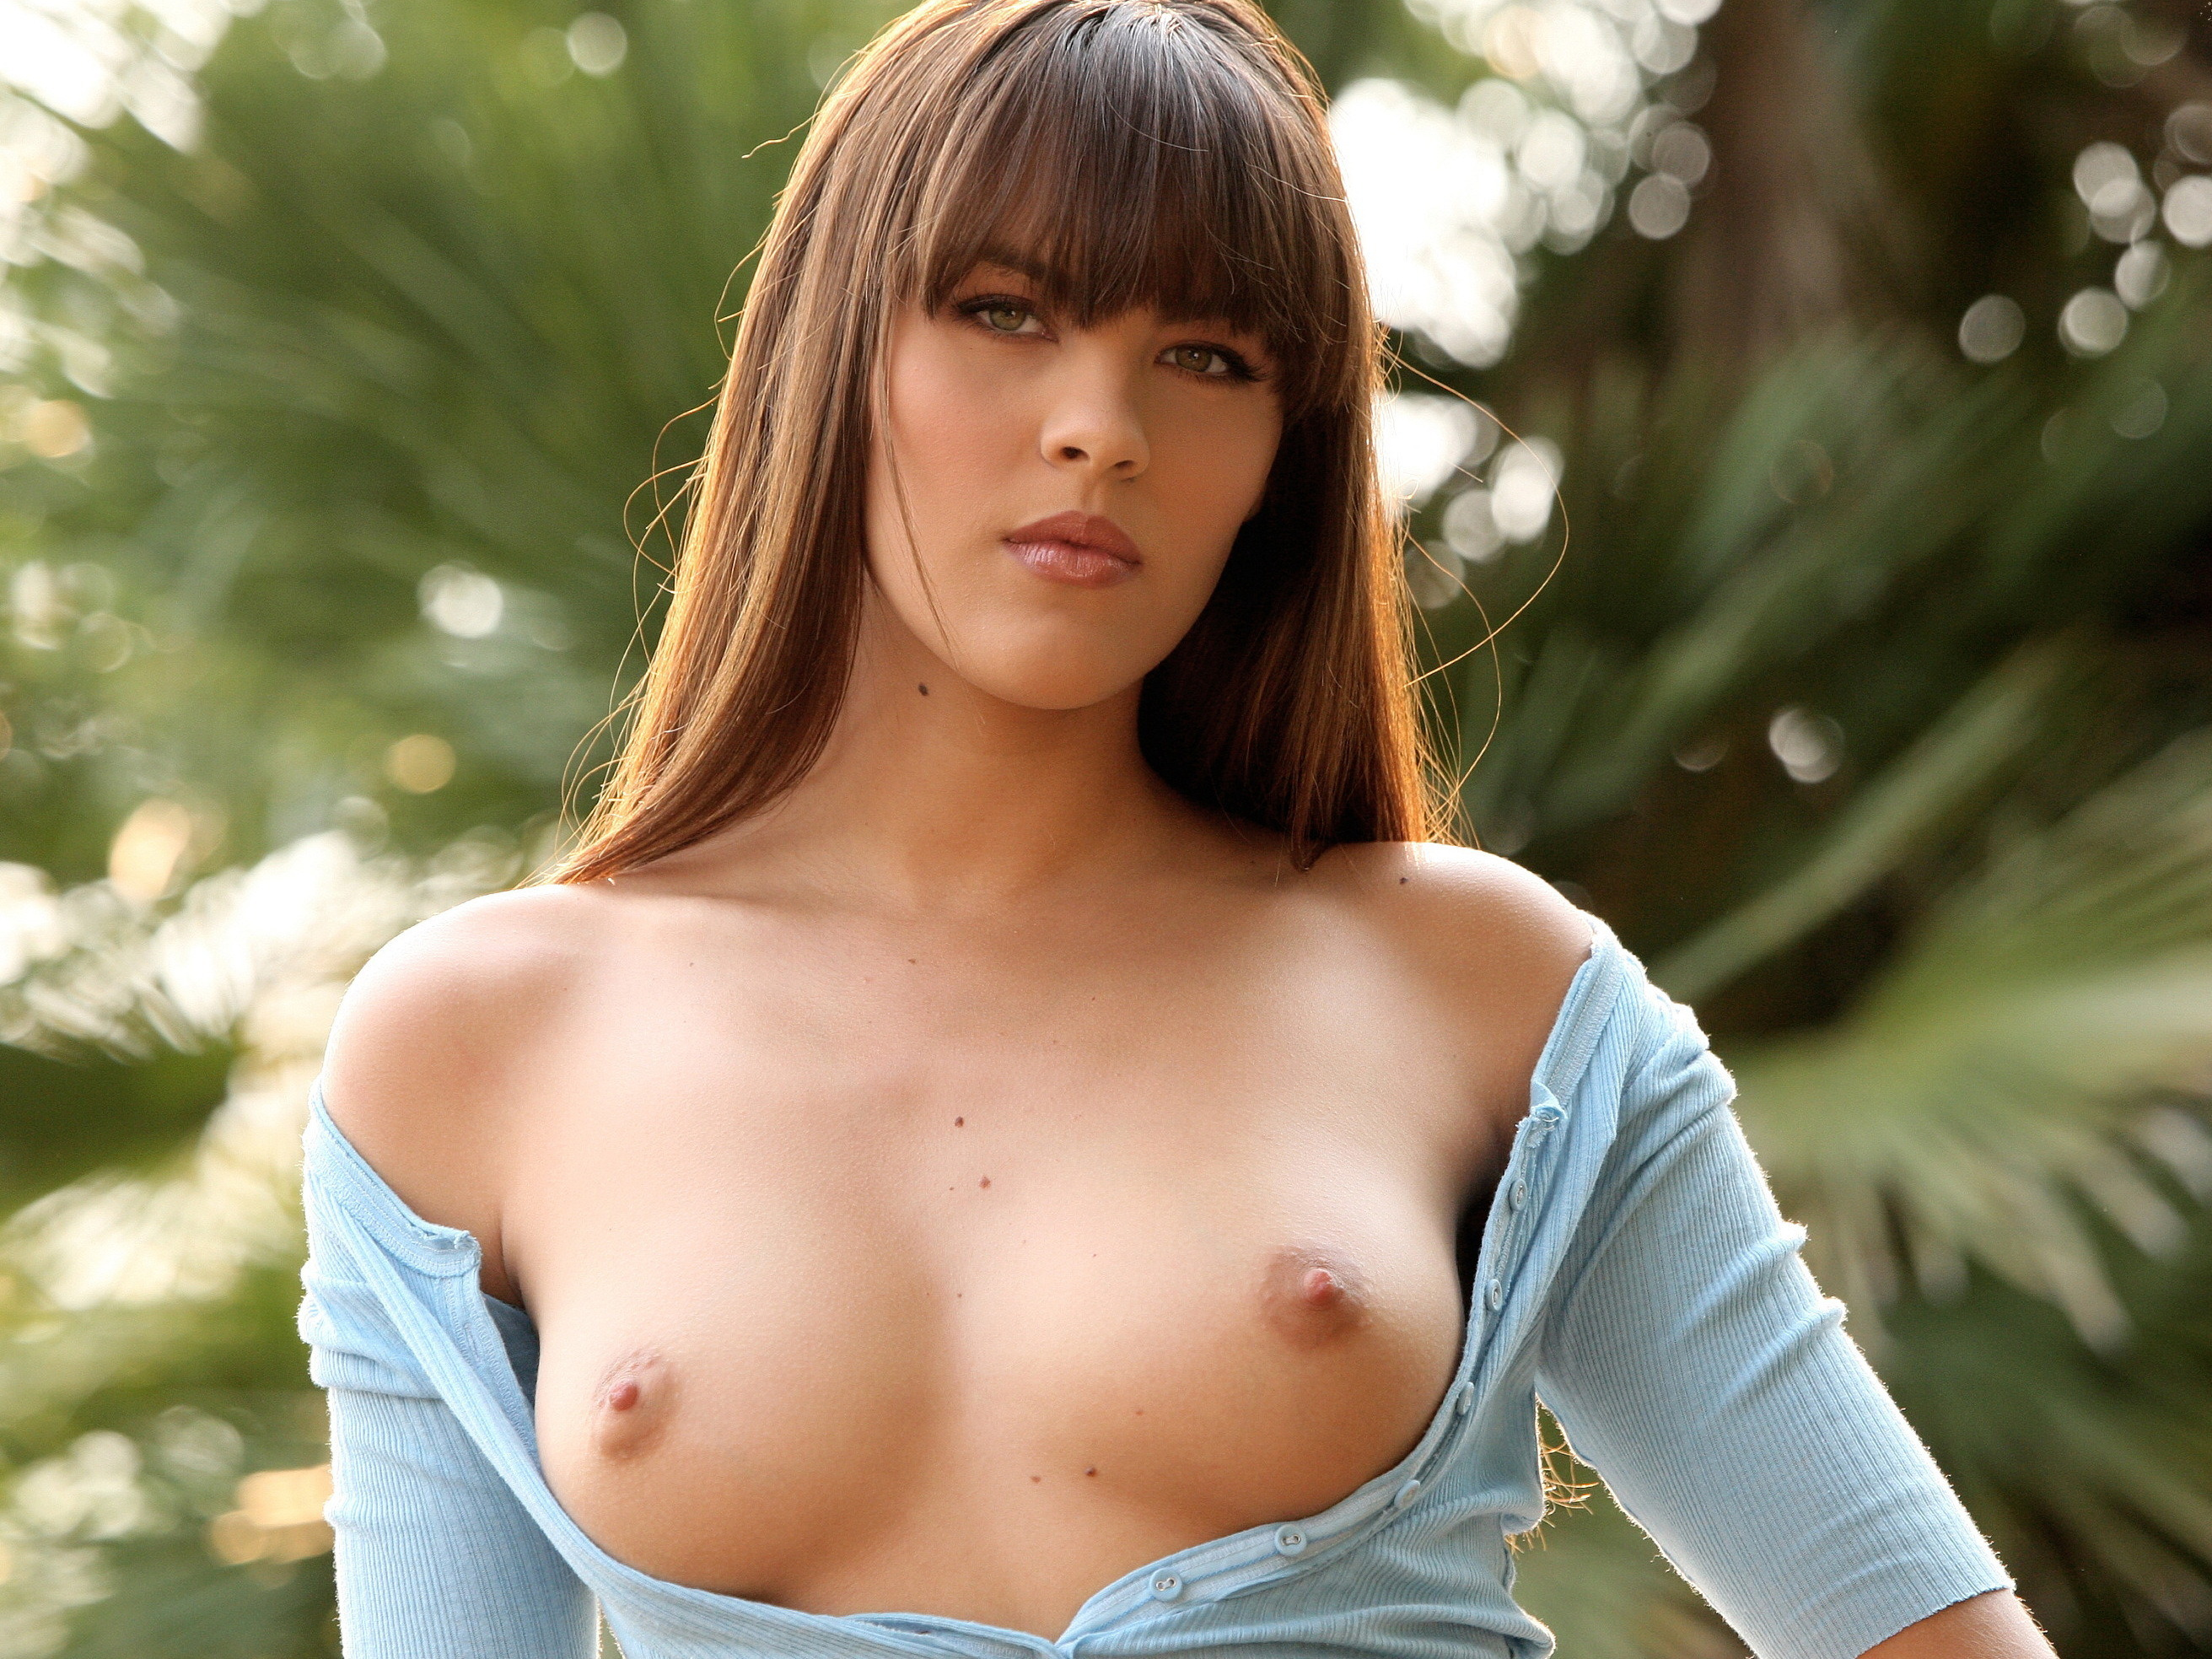 Крутые сиськи в лифчику и в блузке и а джинсах порно фото фото 301-386